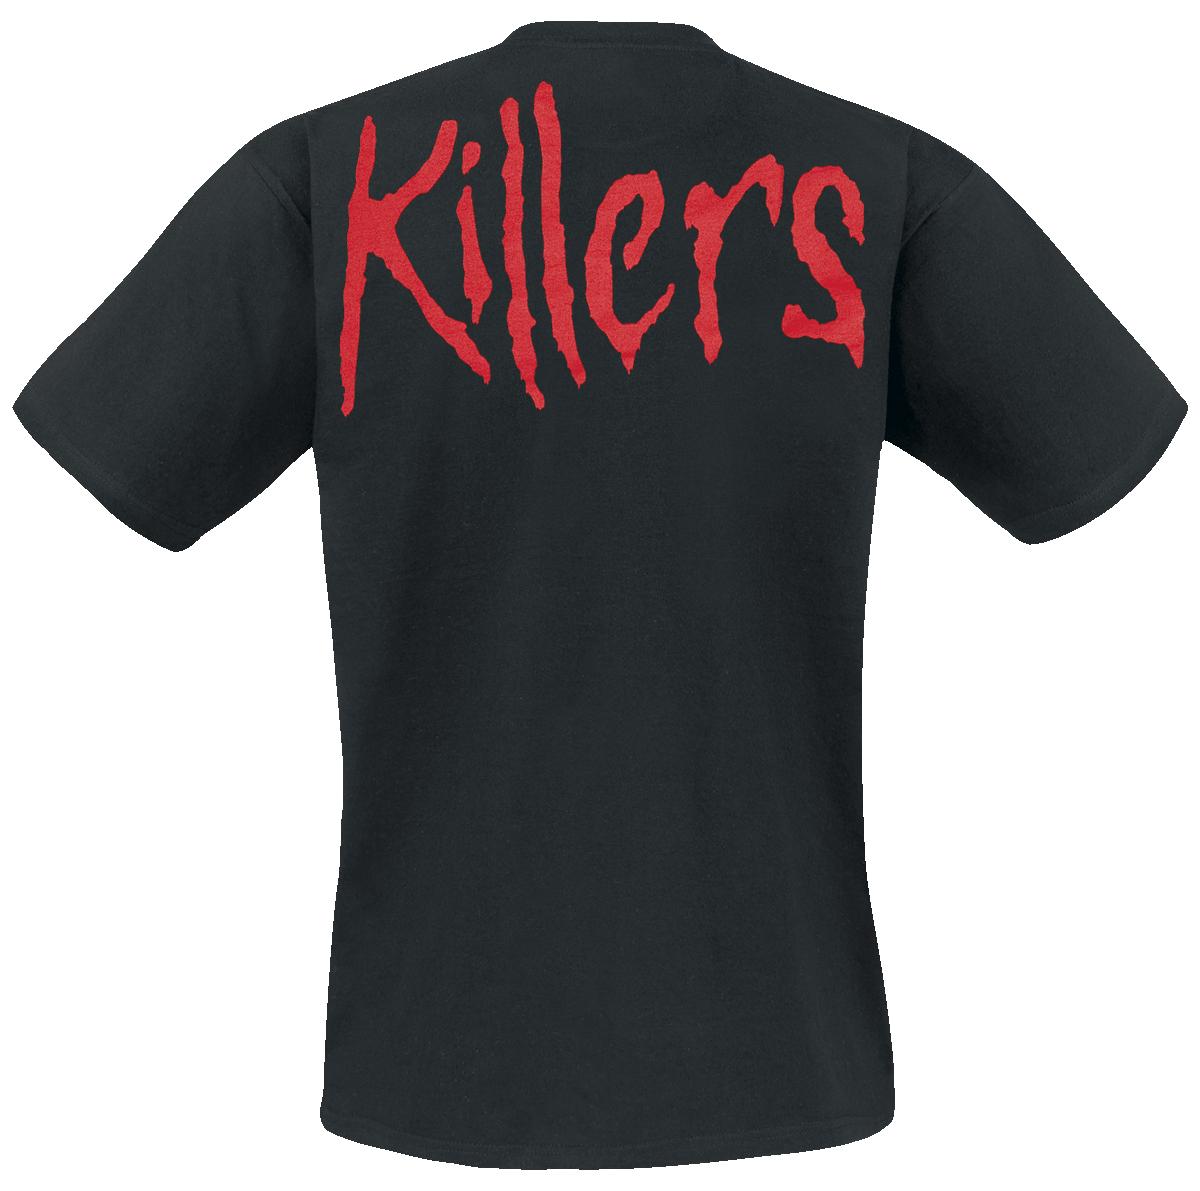 iron maiden killers t shirt schwarz ebay. Black Bedroom Furniture Sets. Home Design Ideas